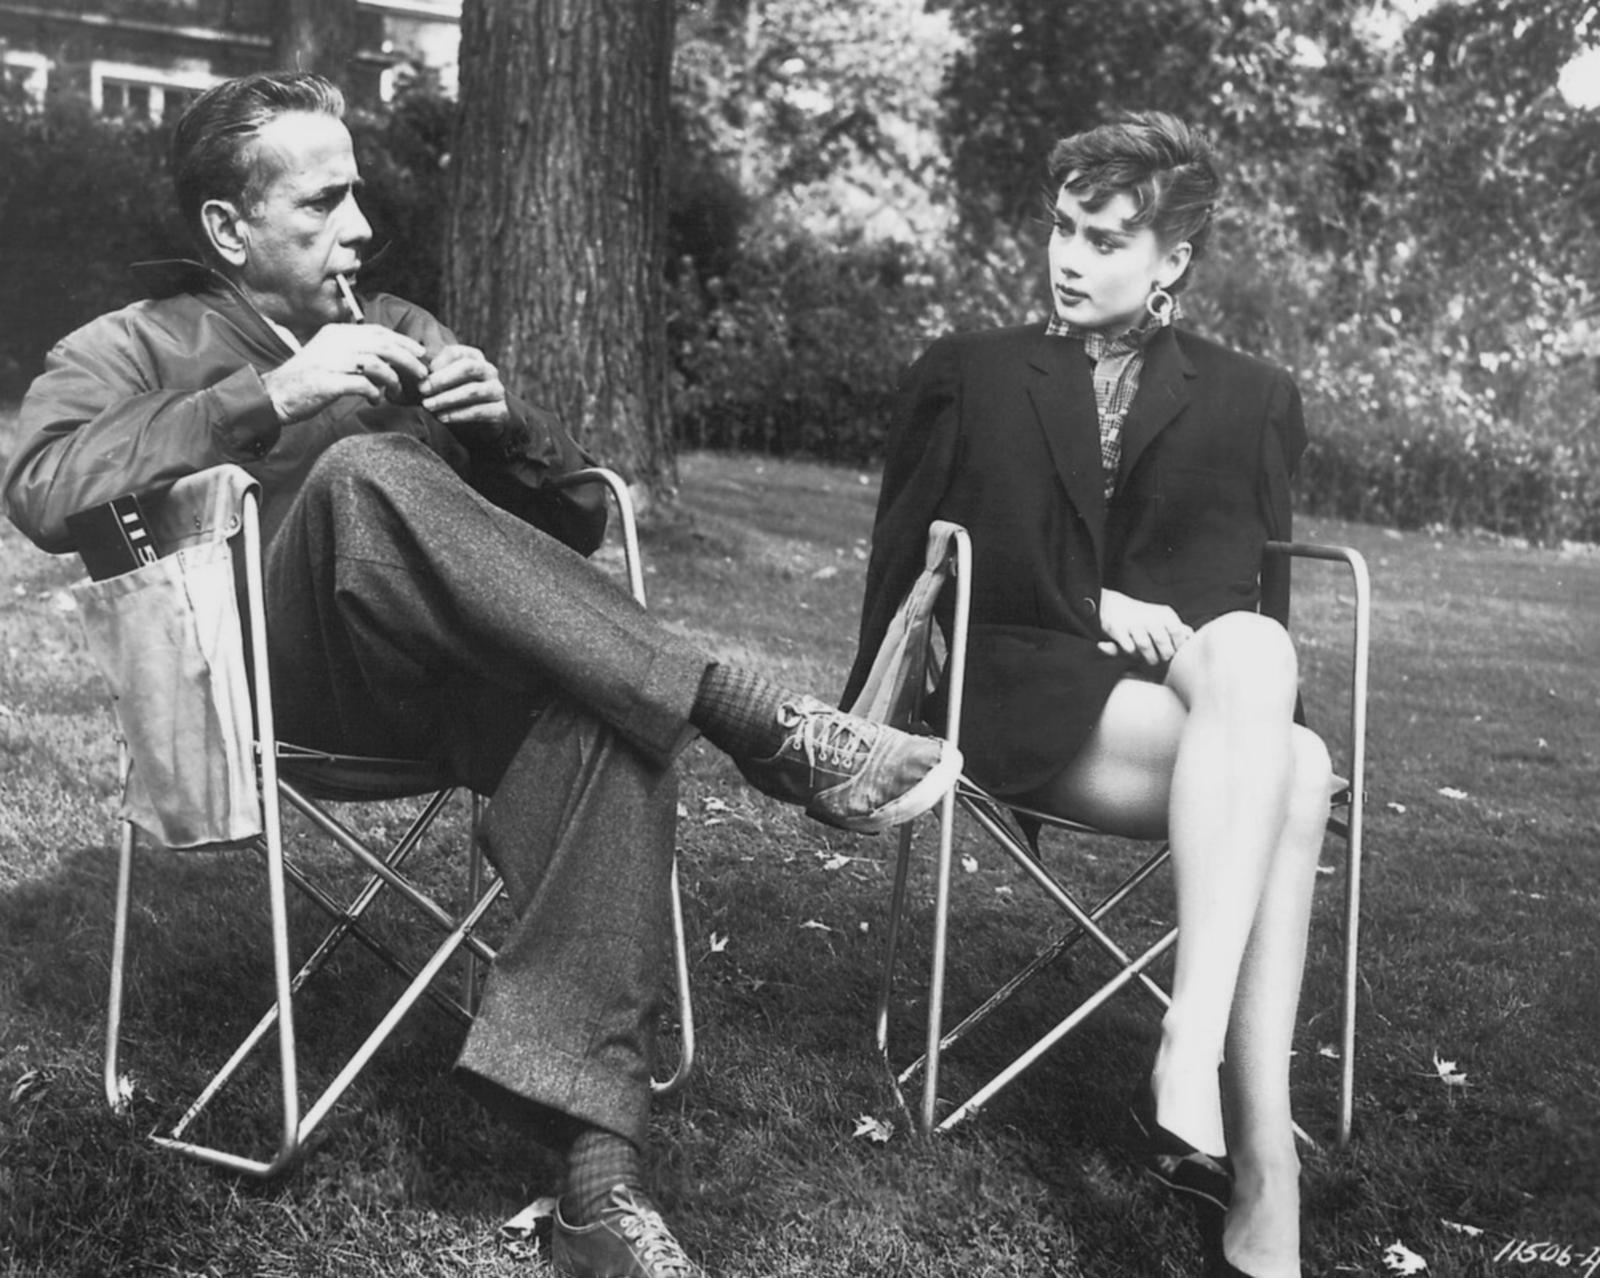 Audrey Hepburn and Humphrey Bogart on the set of Sabrina, 1954.